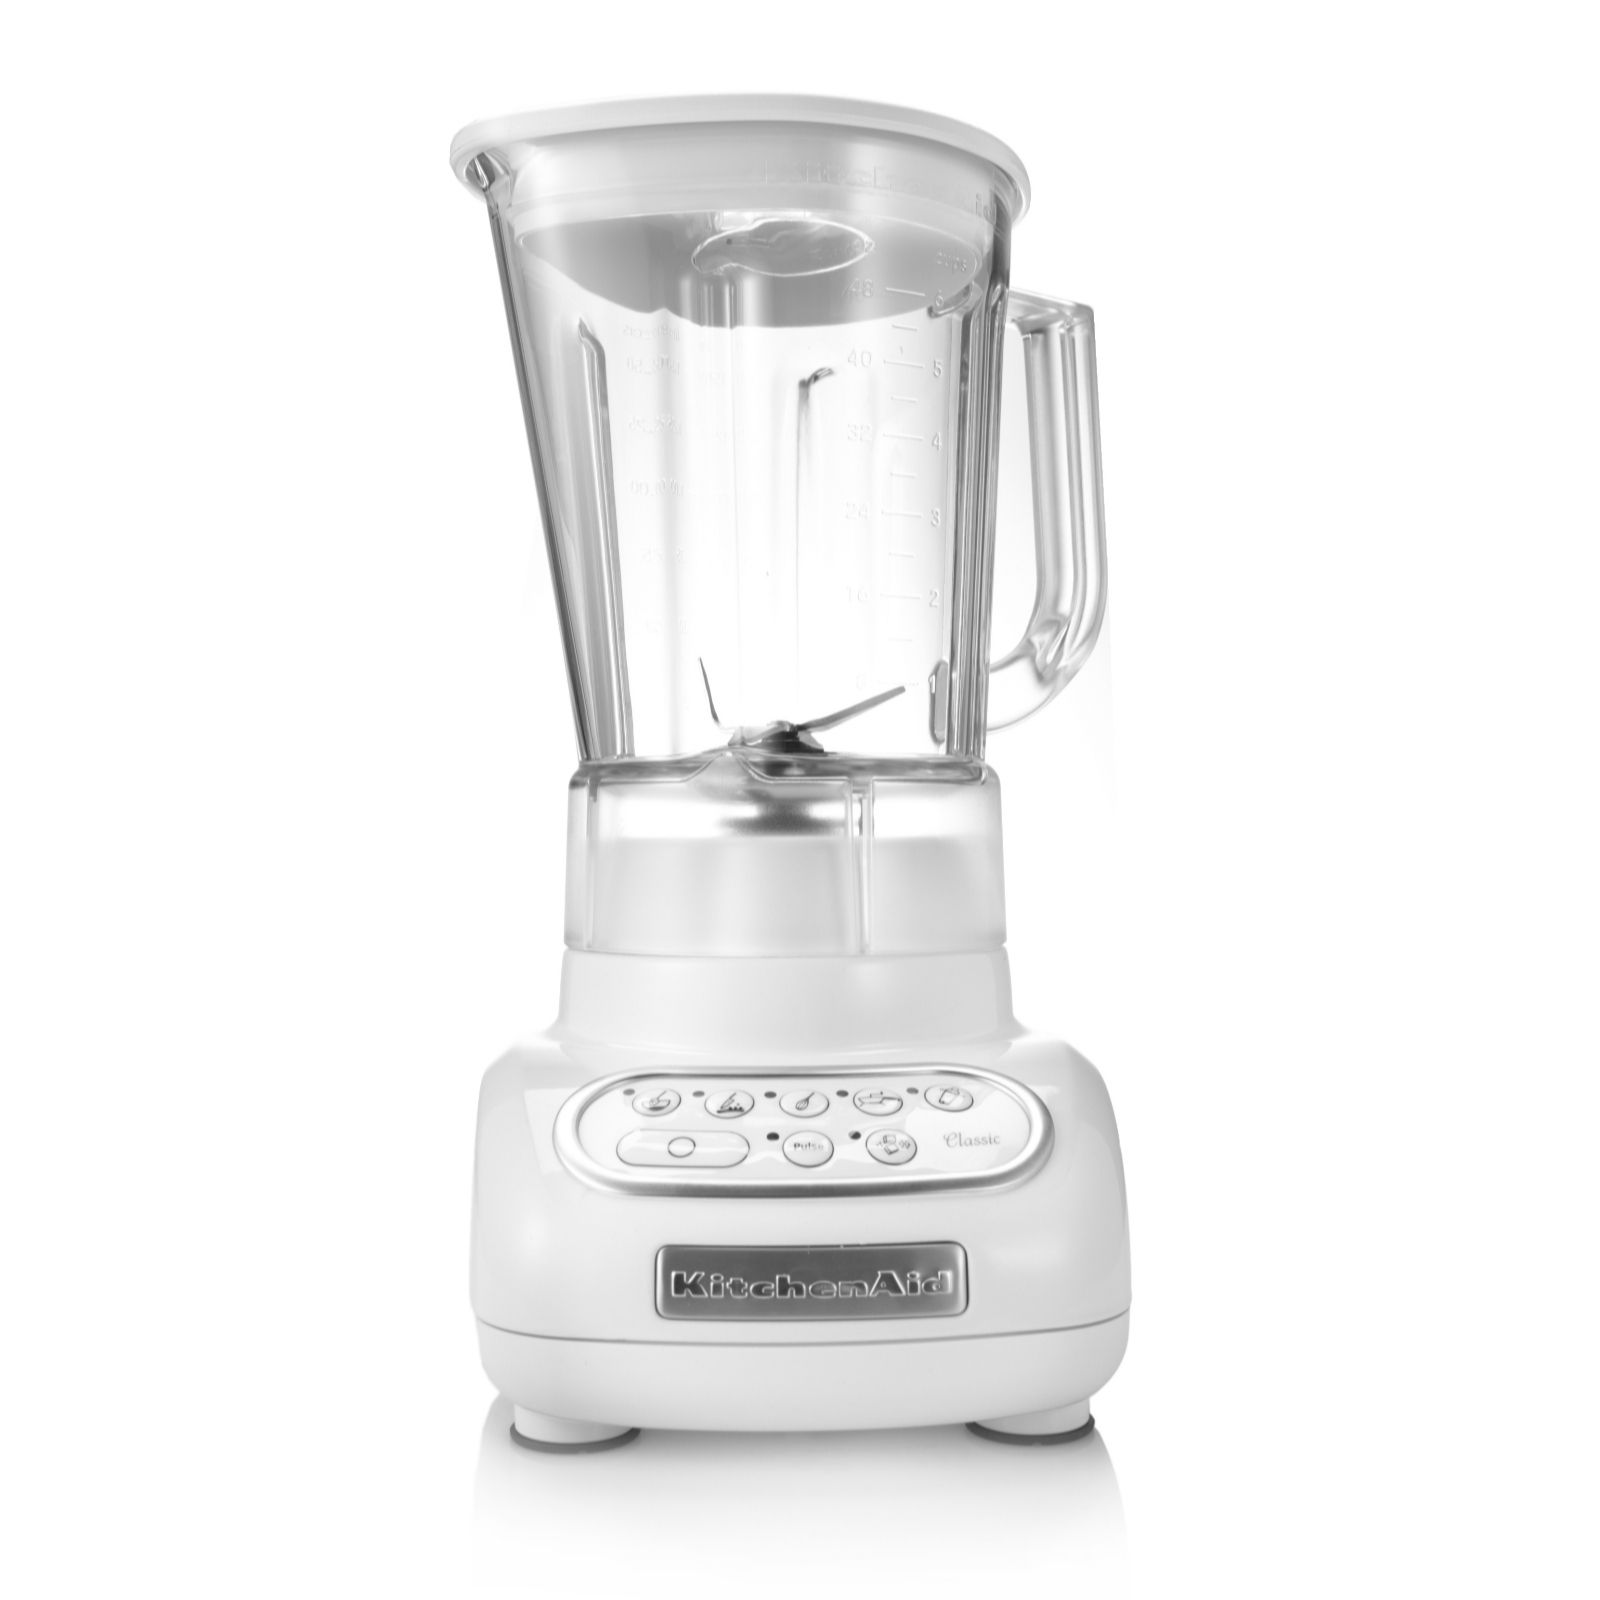 kitchen aid blenders metal table kitchenaid classic white blender qvc uk product thumbnail in stock